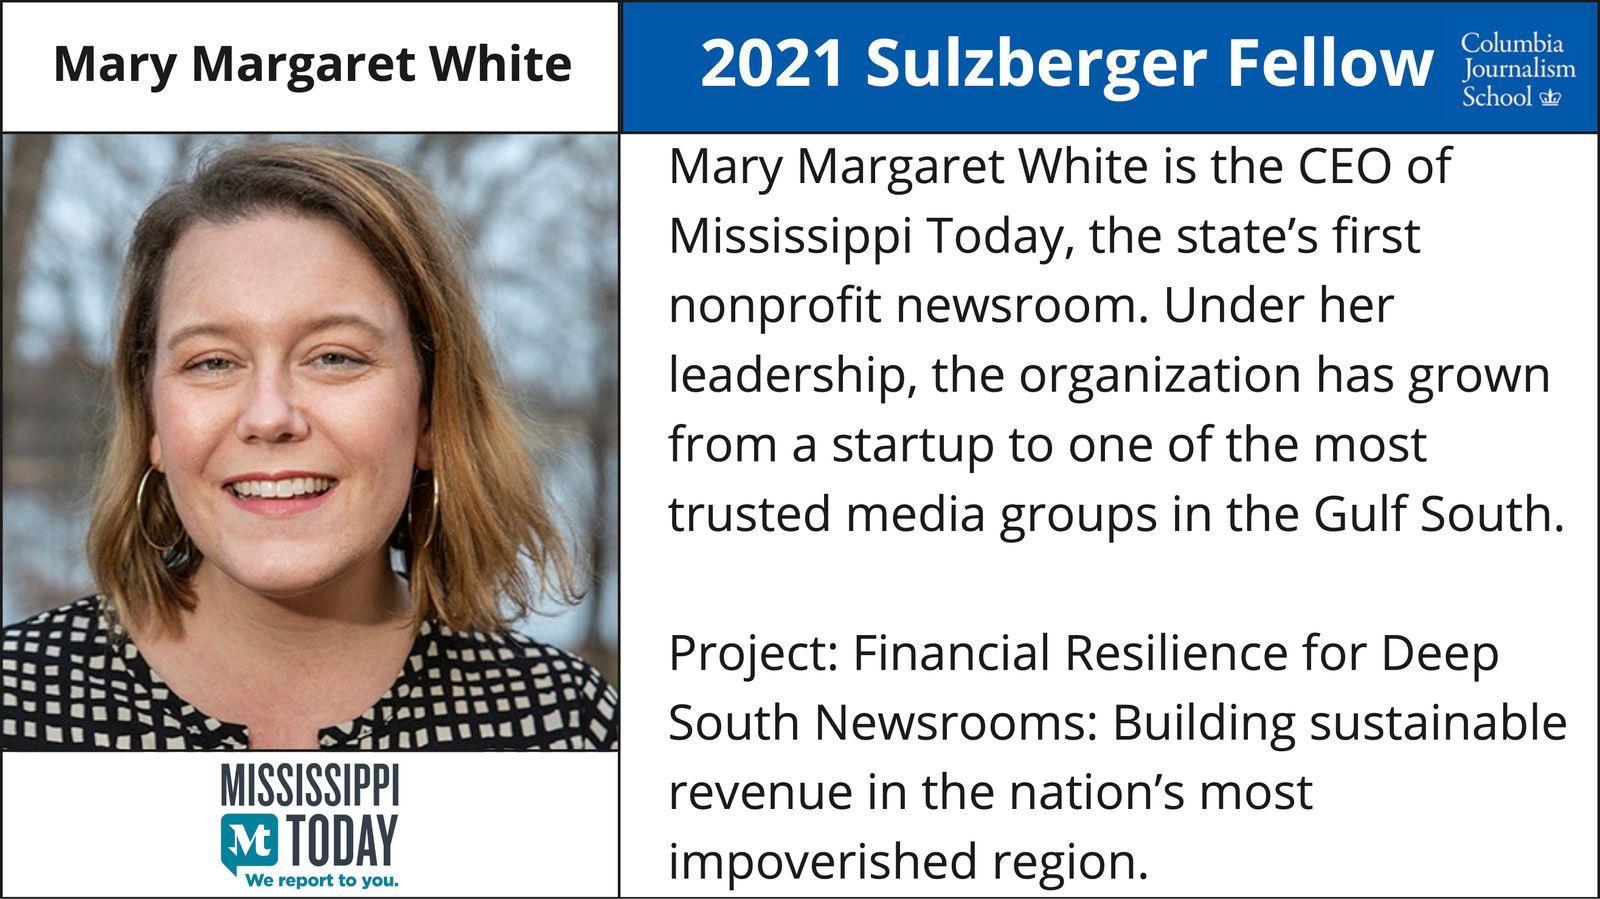 Mary Margaret White